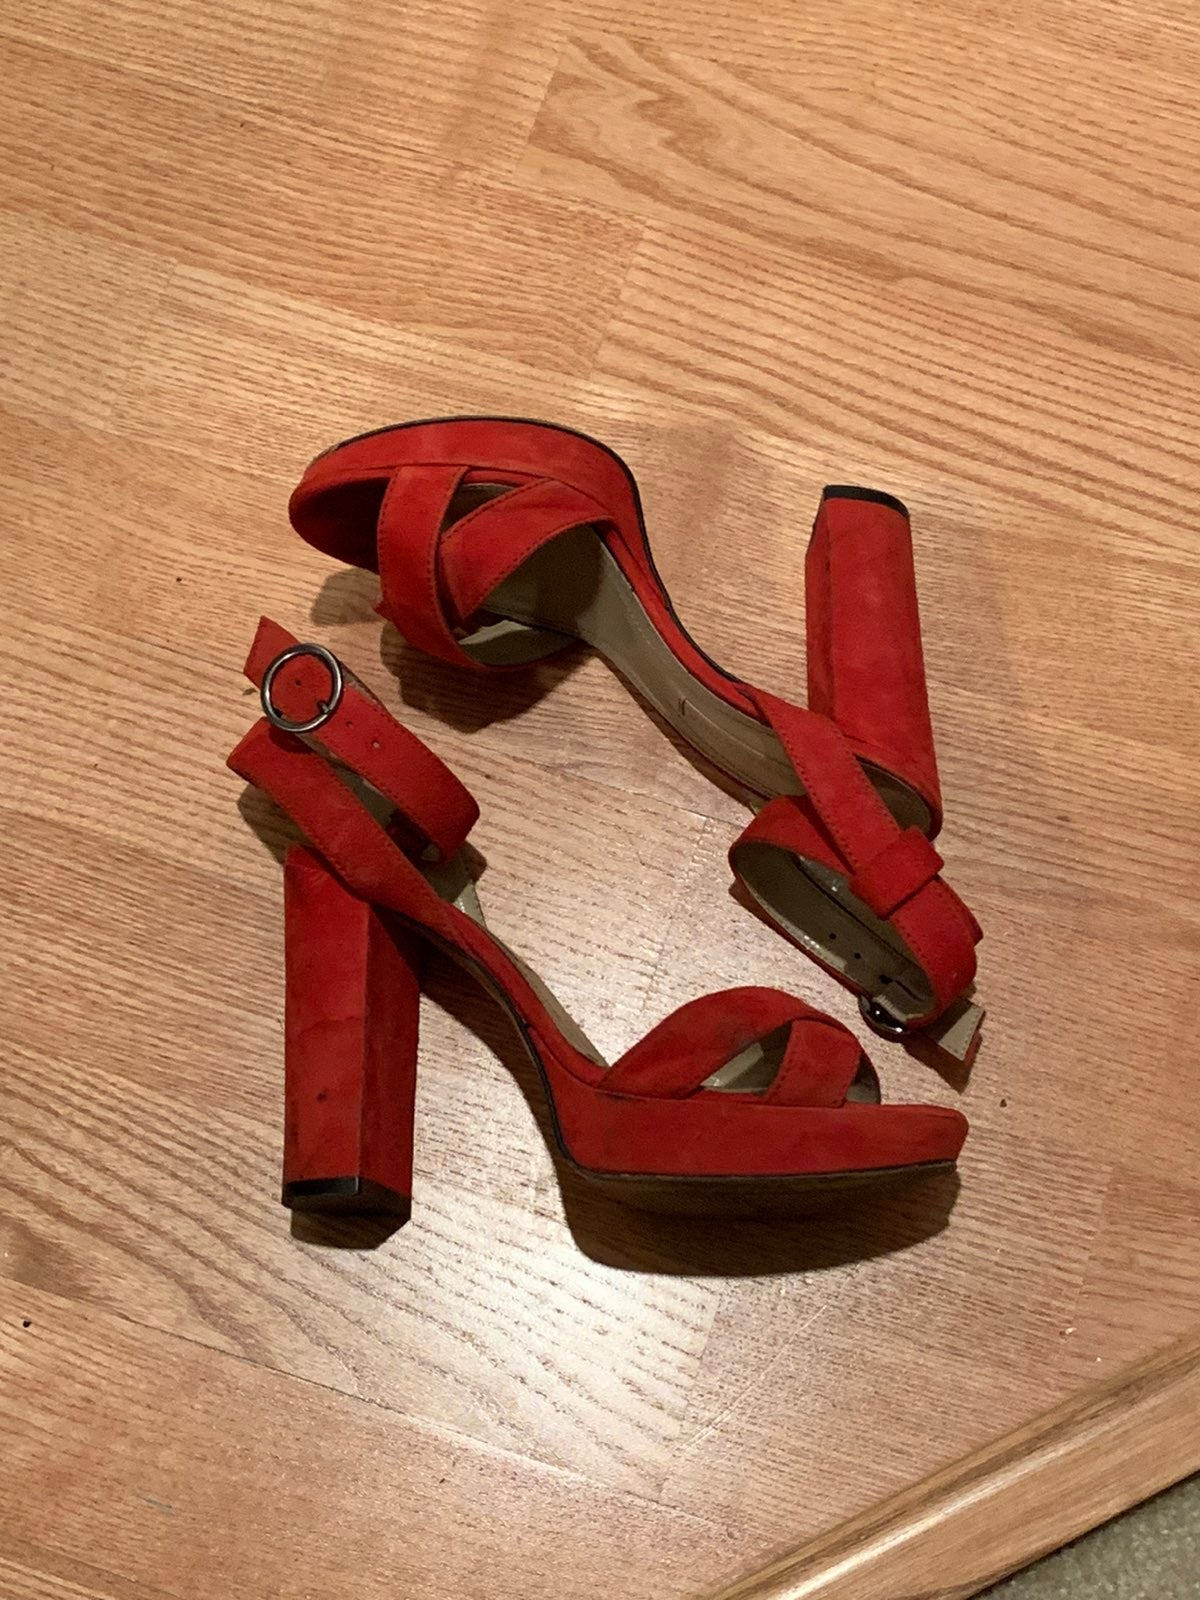 Gently used Red BCBGMAXAZRIA Heels - 6M